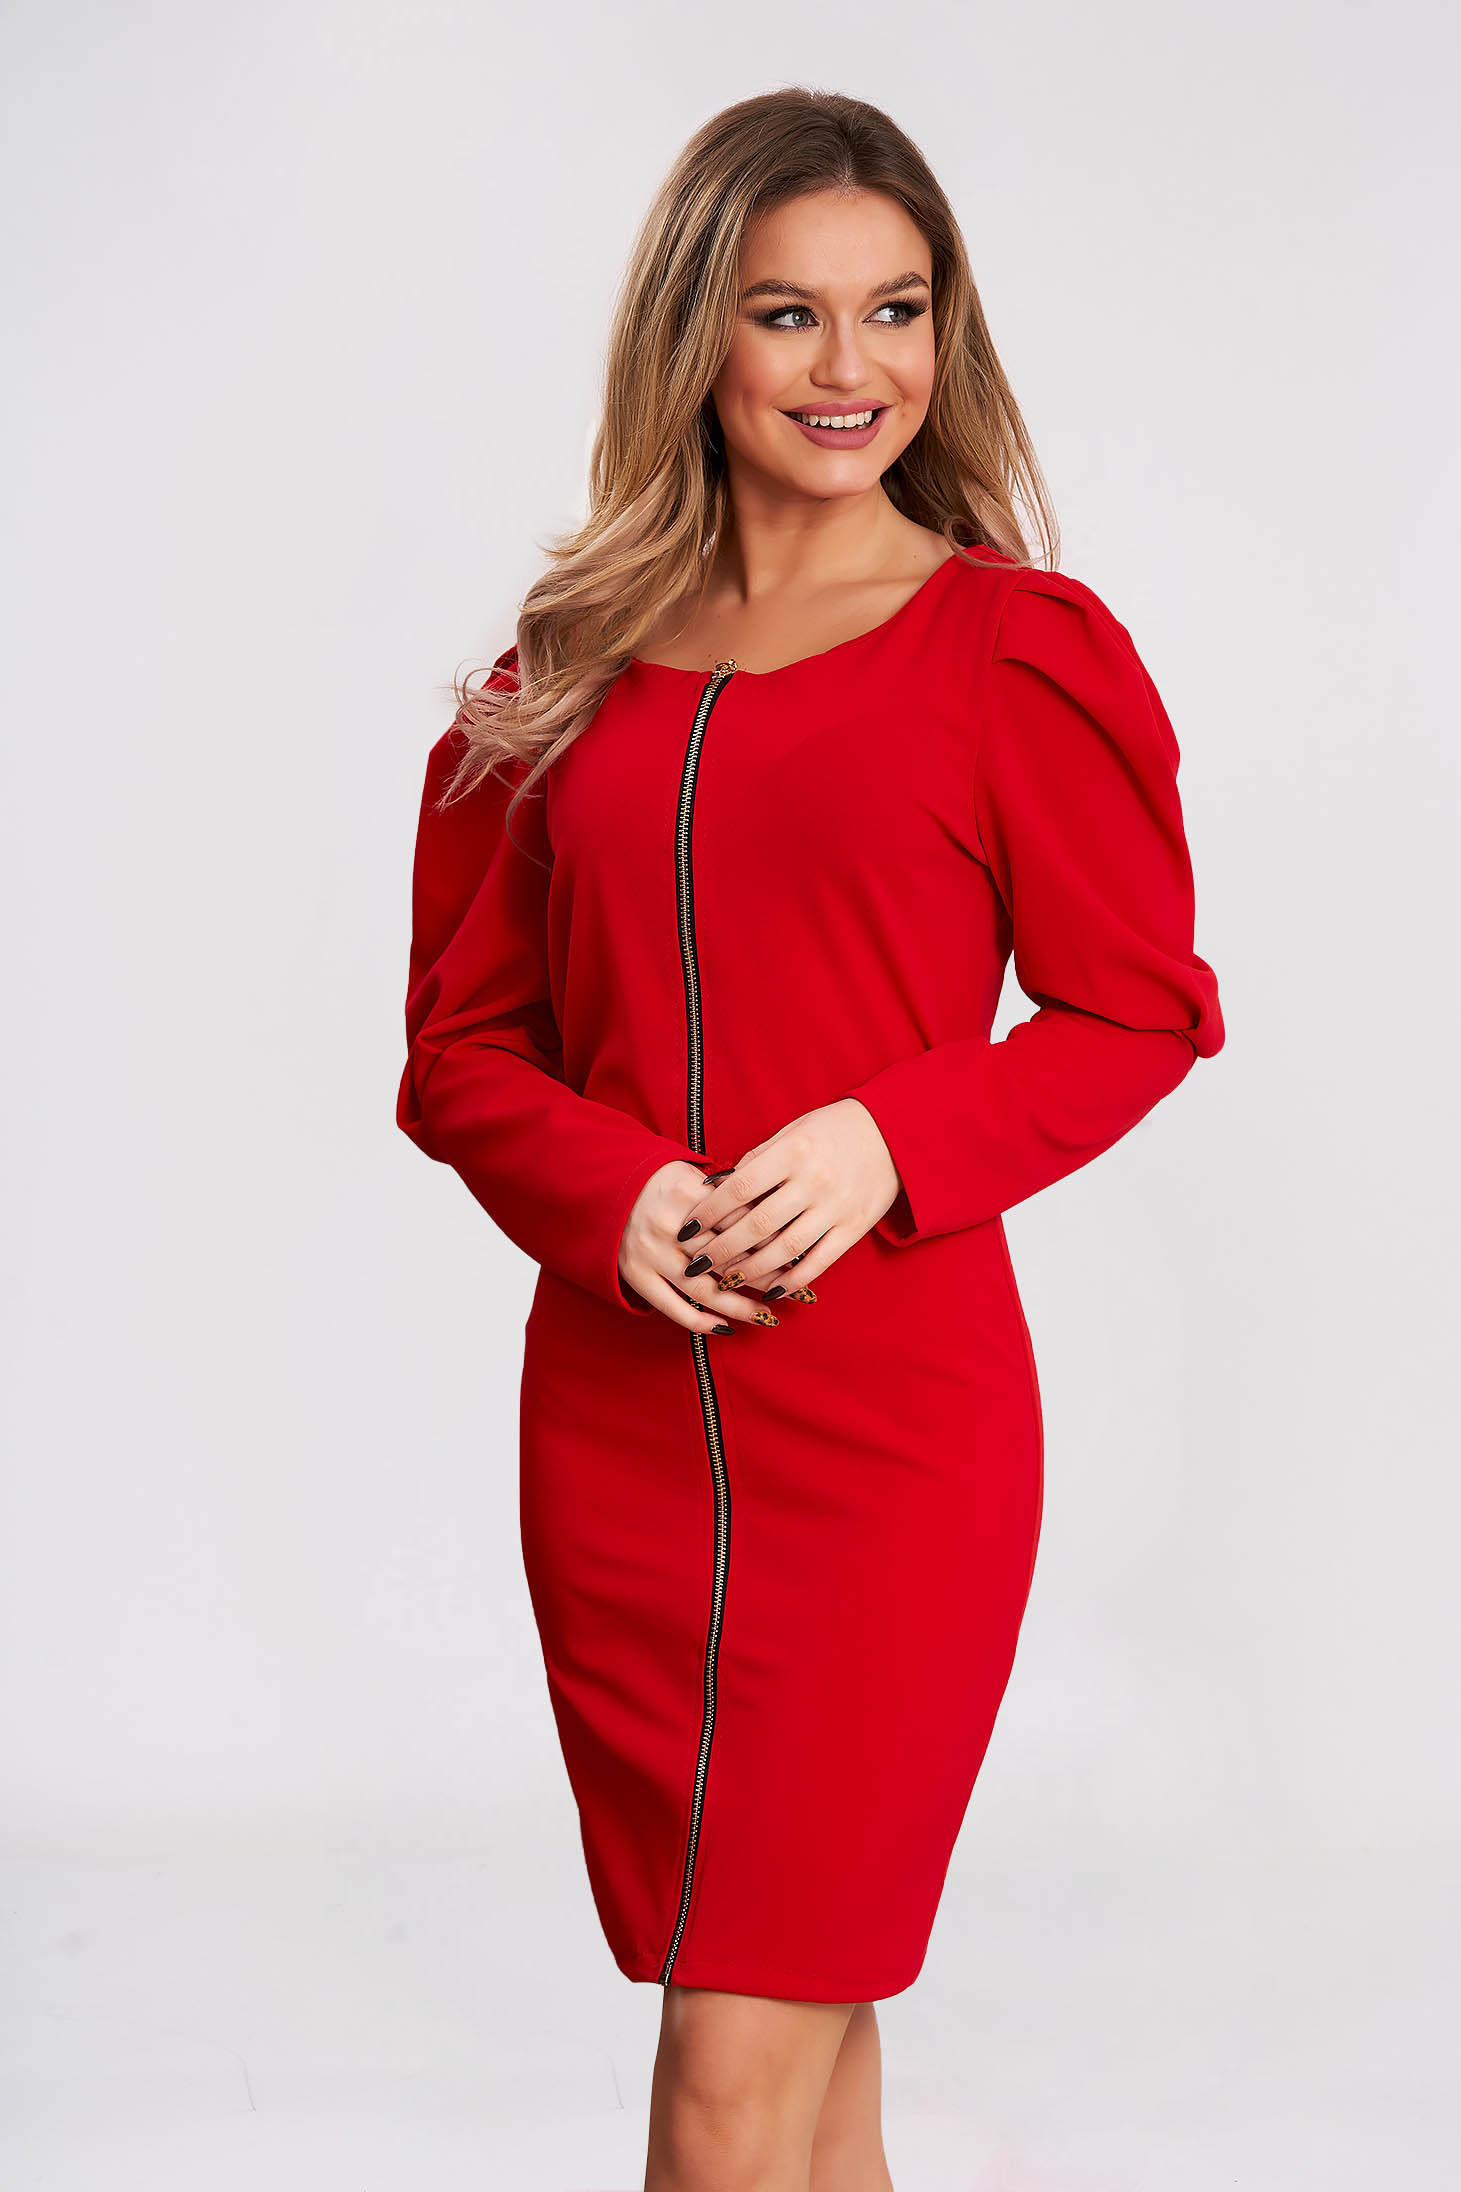 Dress slightly elastic fabric red short cut flared high shoulders